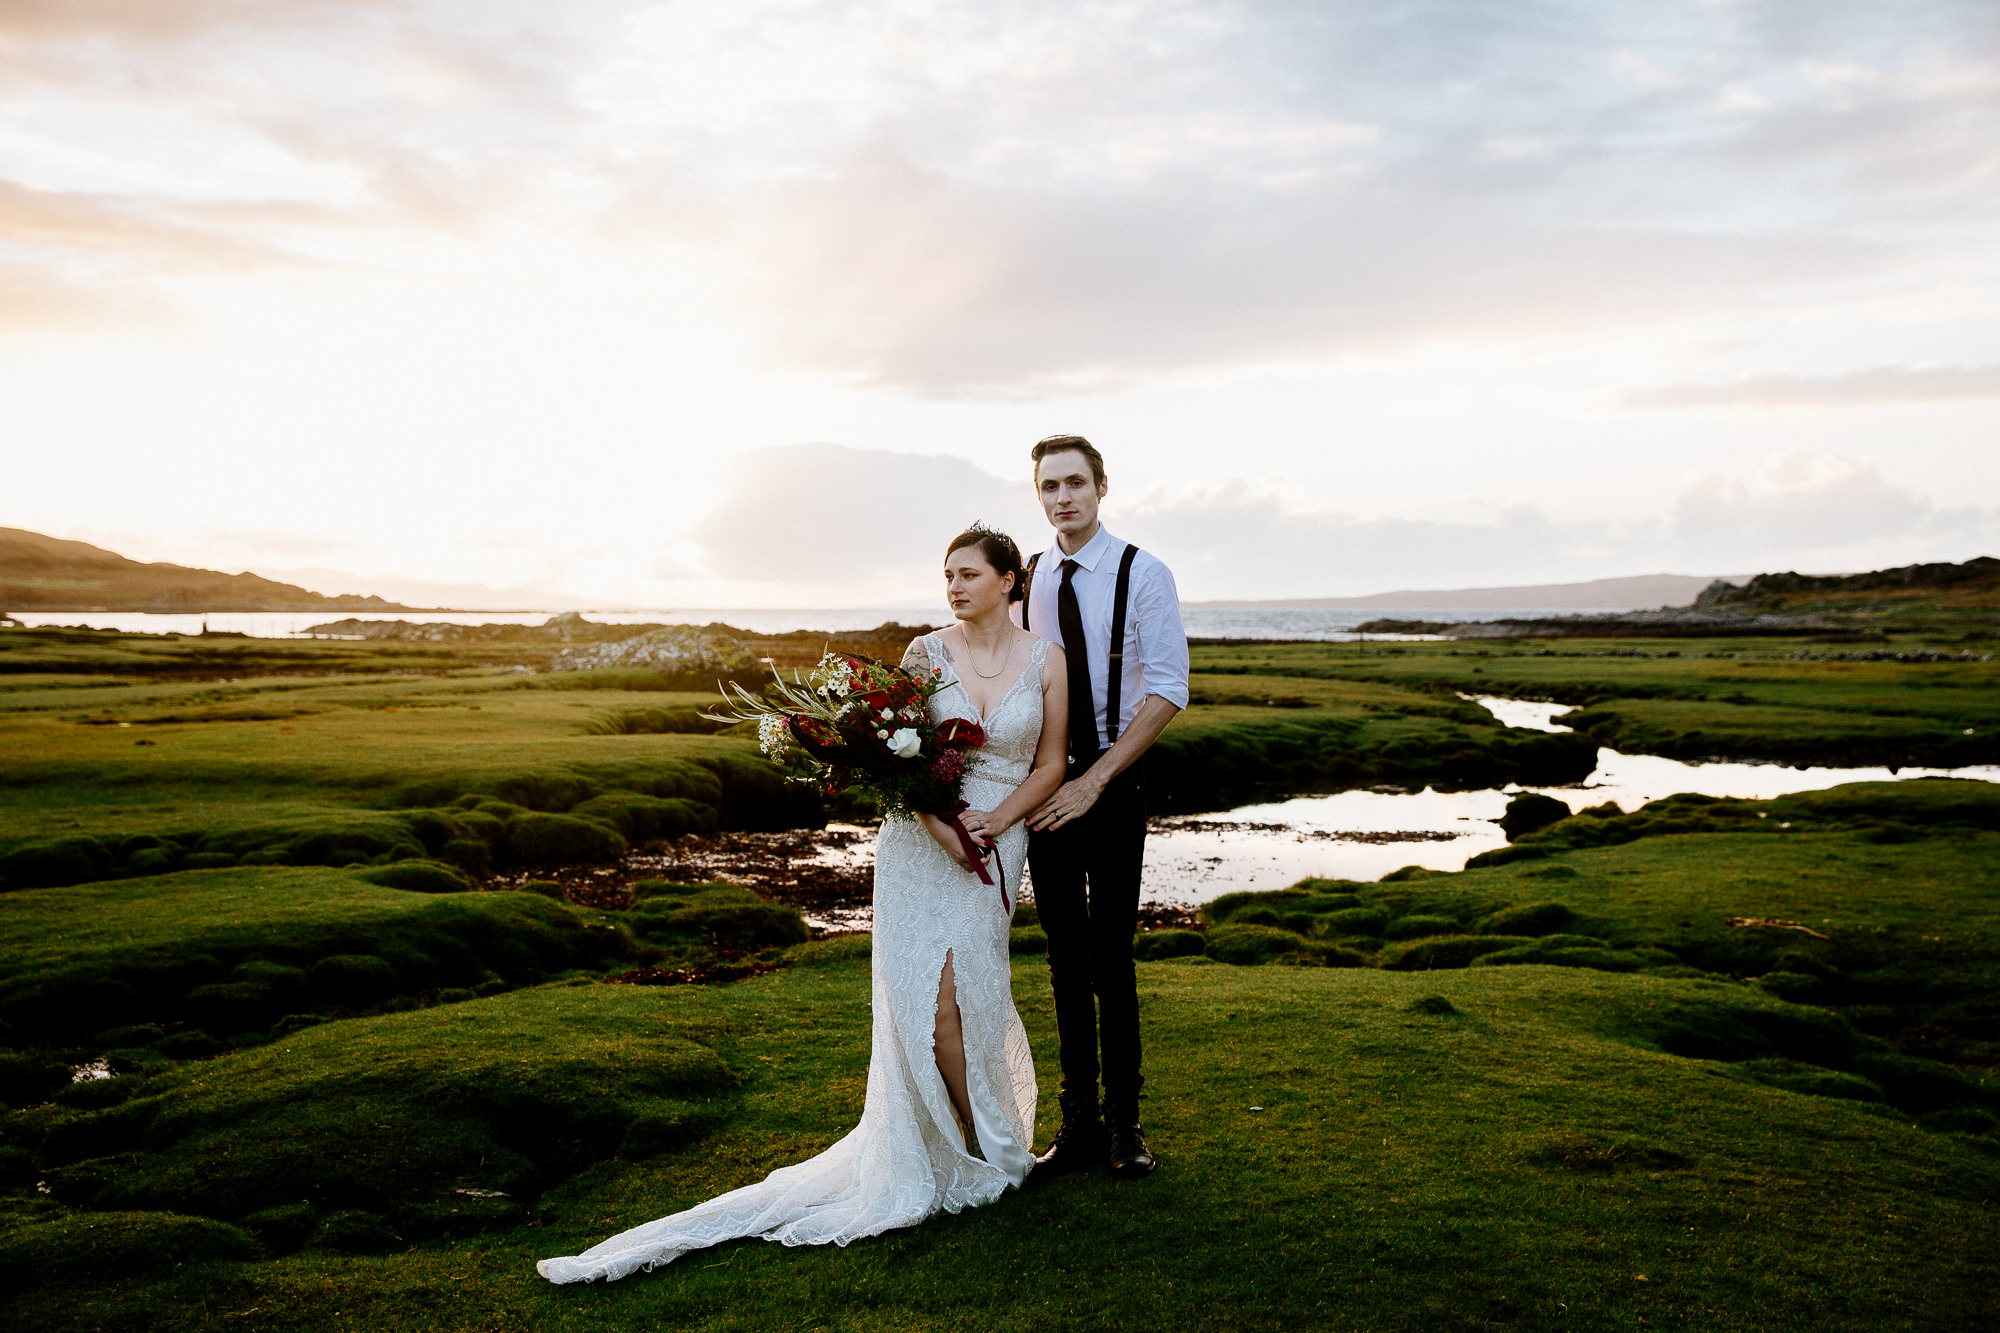 Jen_Montgomery_Photography_Scotland_Wedding_CorrieWill_FB-784.jpg